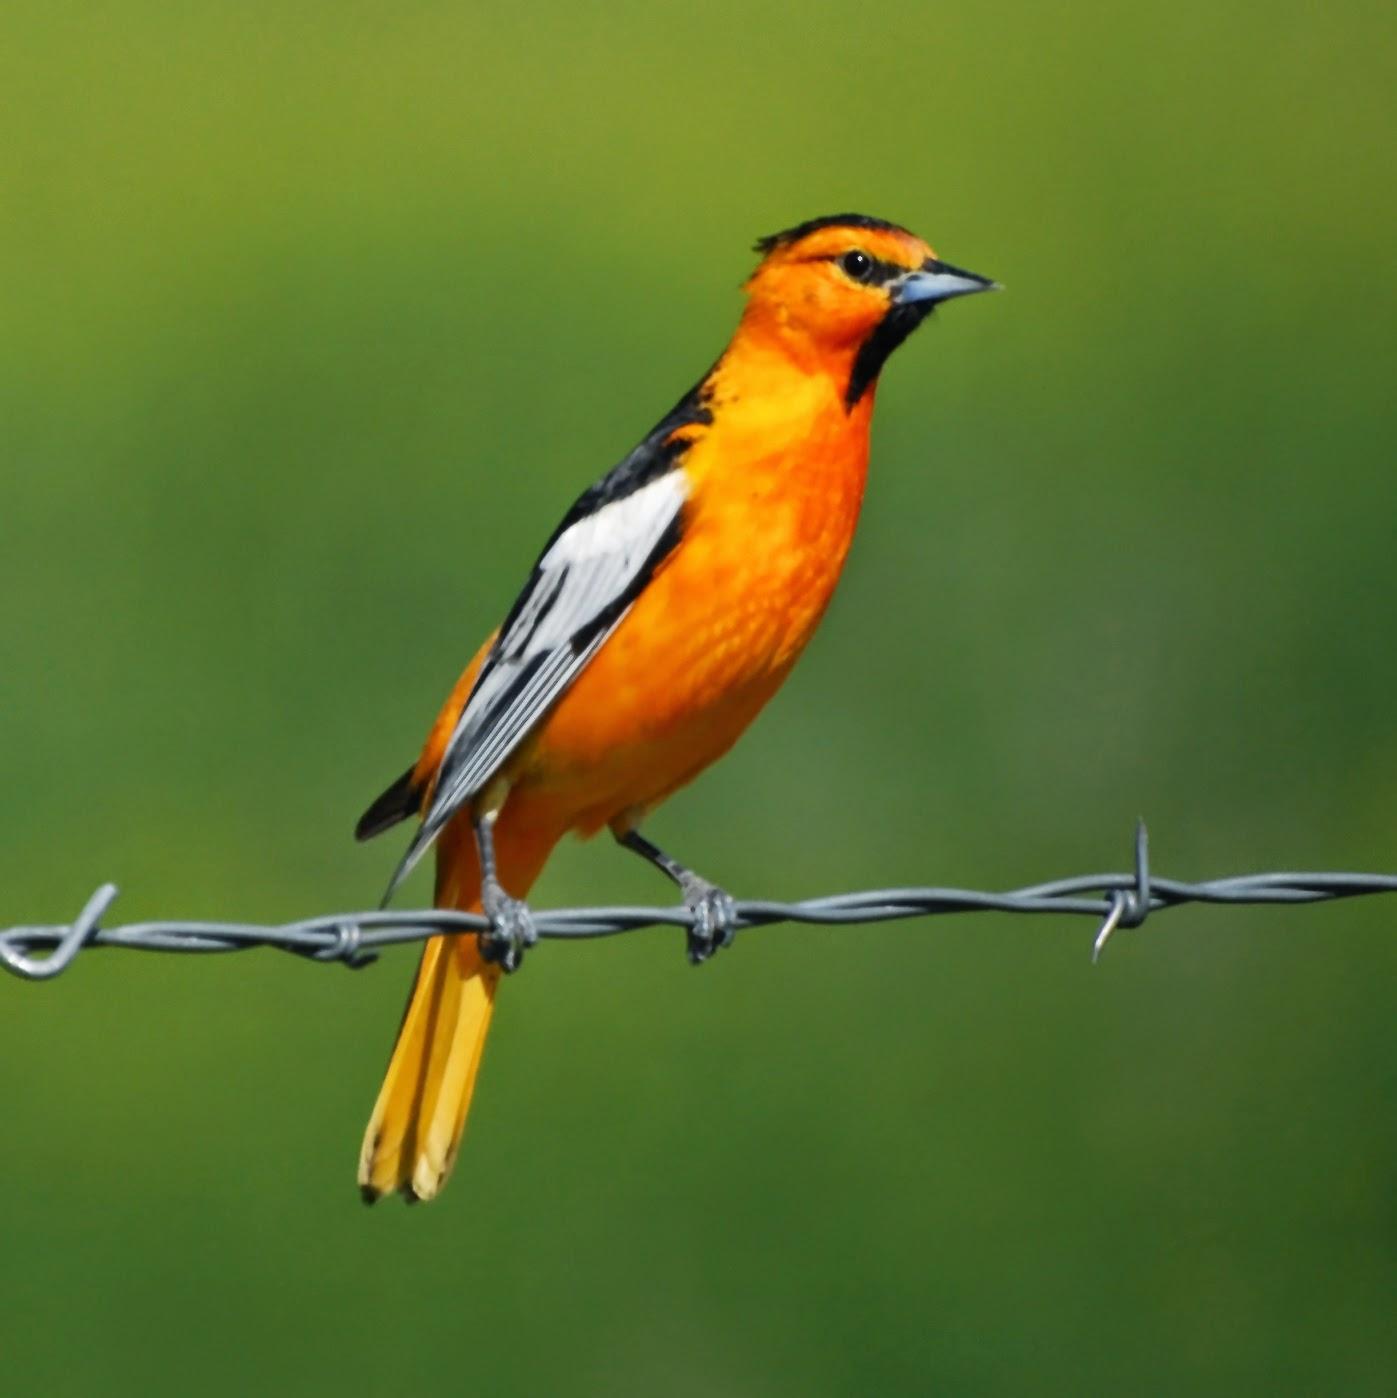 10 Captivating Orange-colored Birds